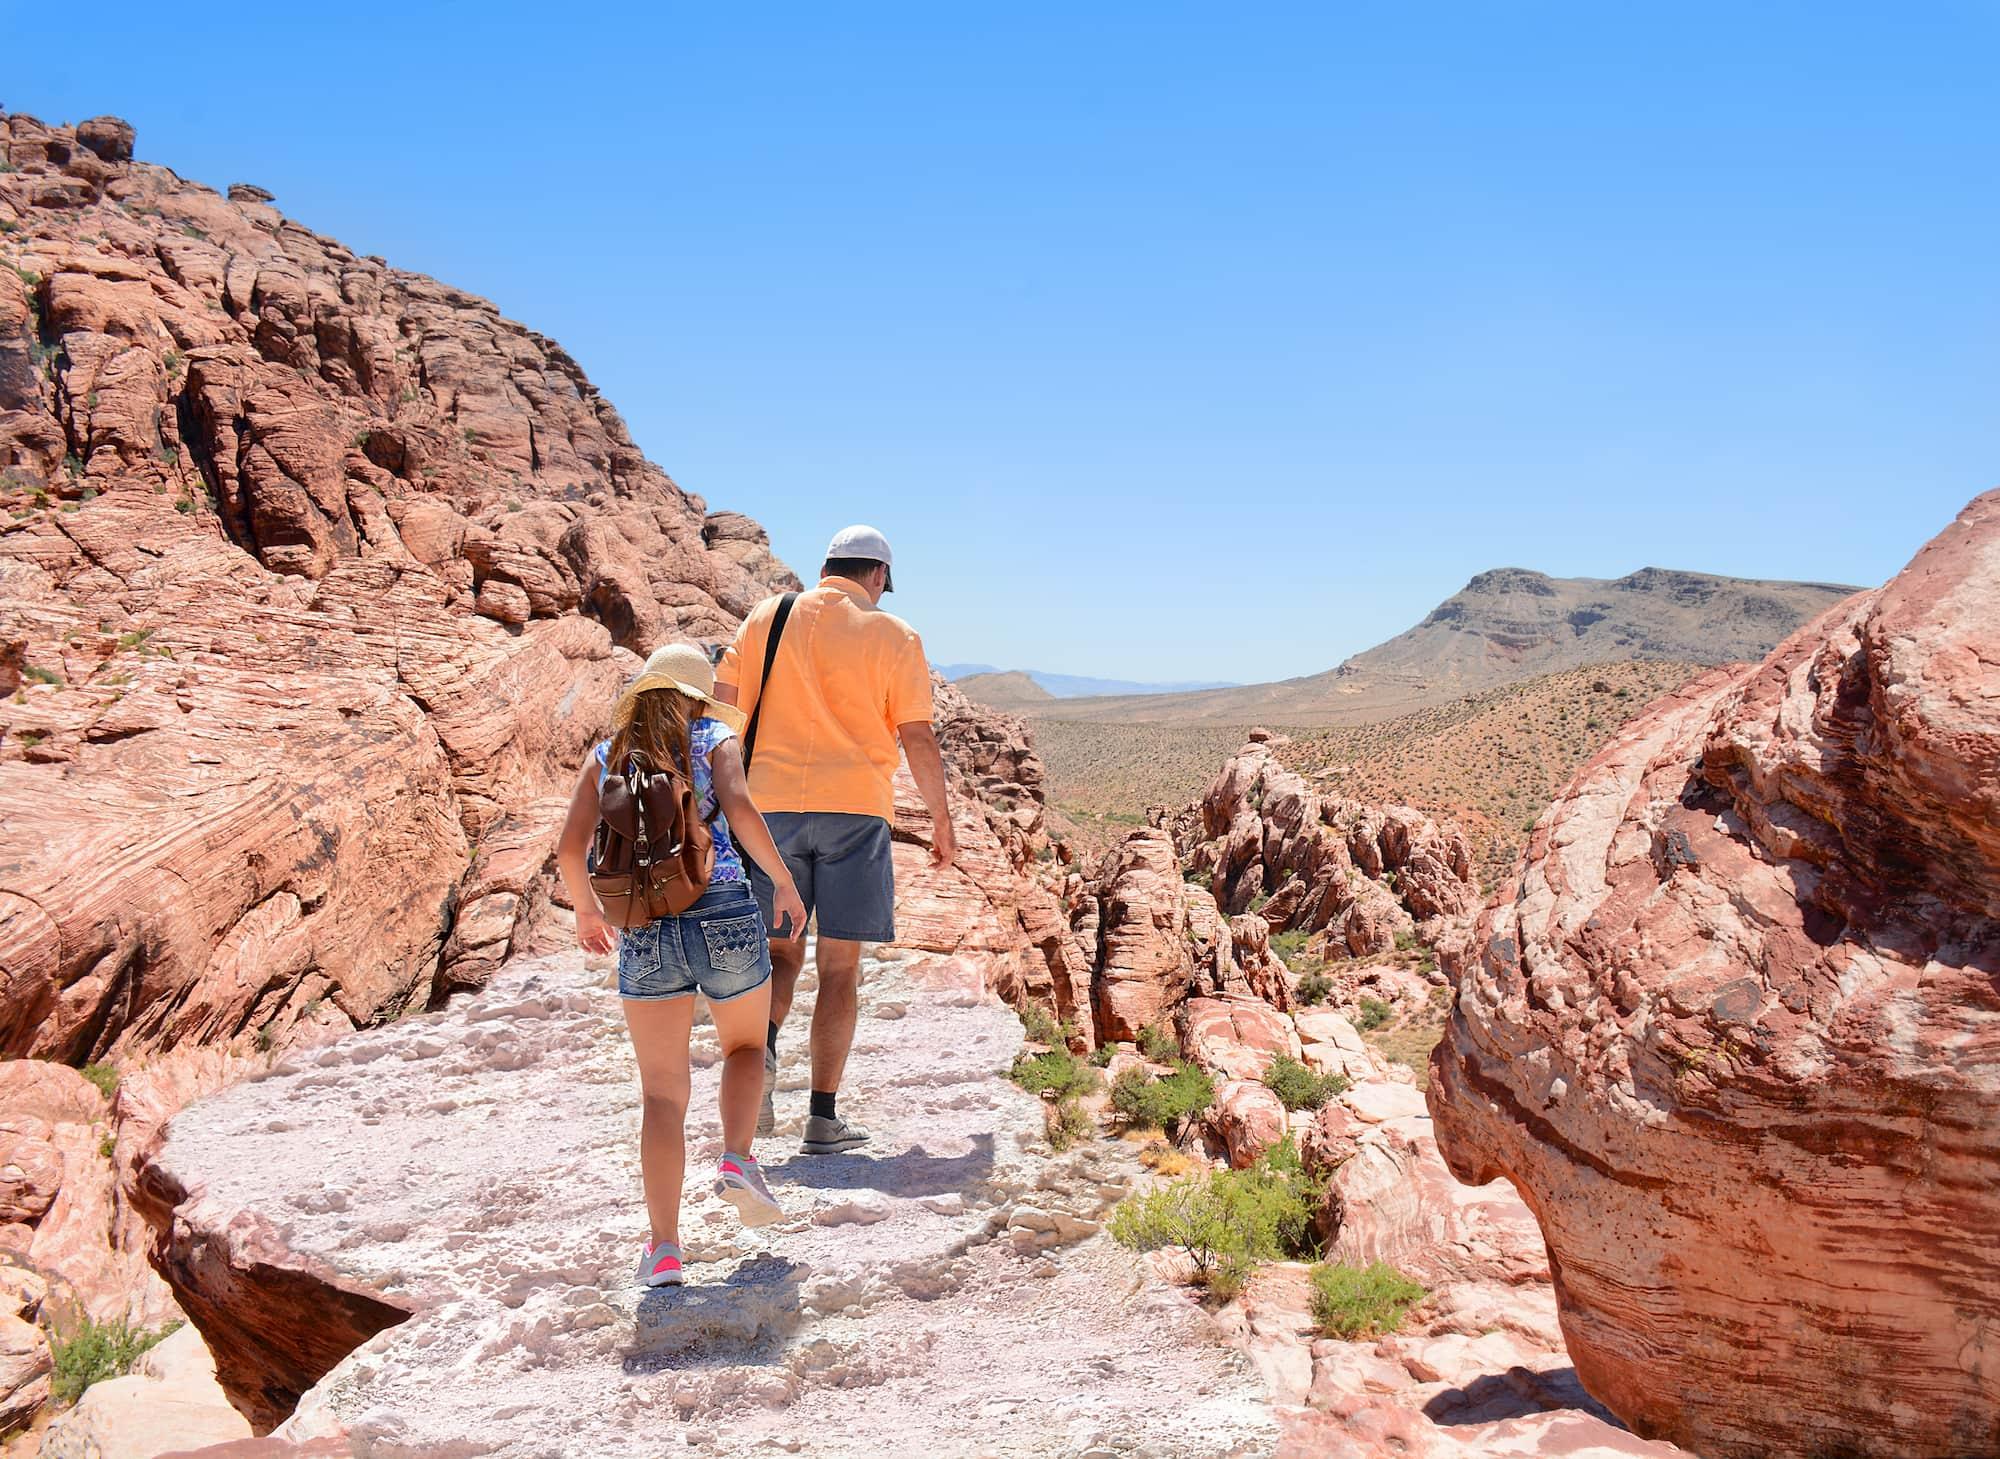 people hiking near red rocks